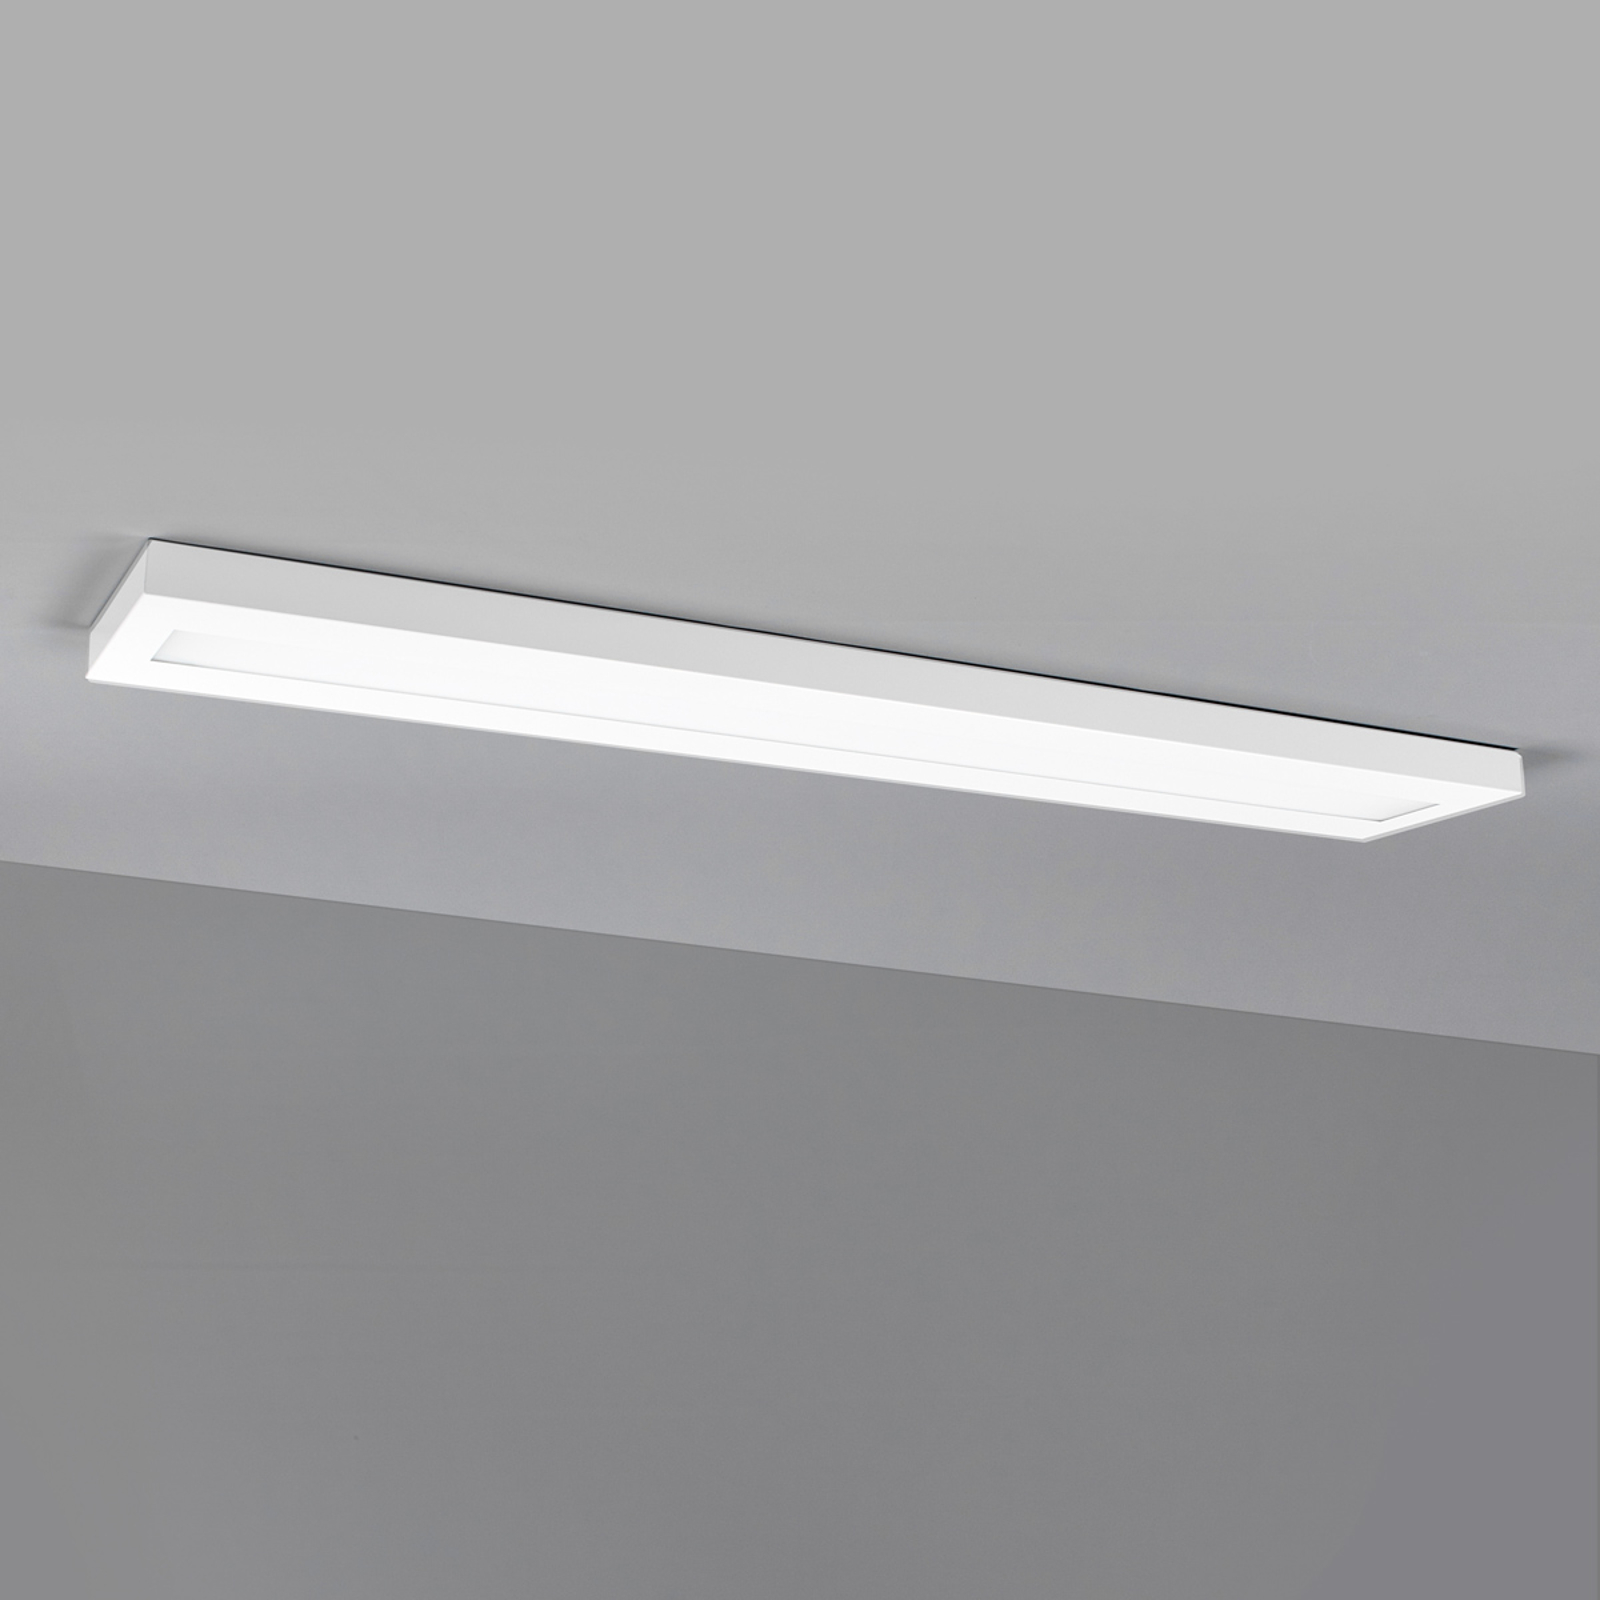 Langwerpige LED opbouwlamp 33 W wit, BAP